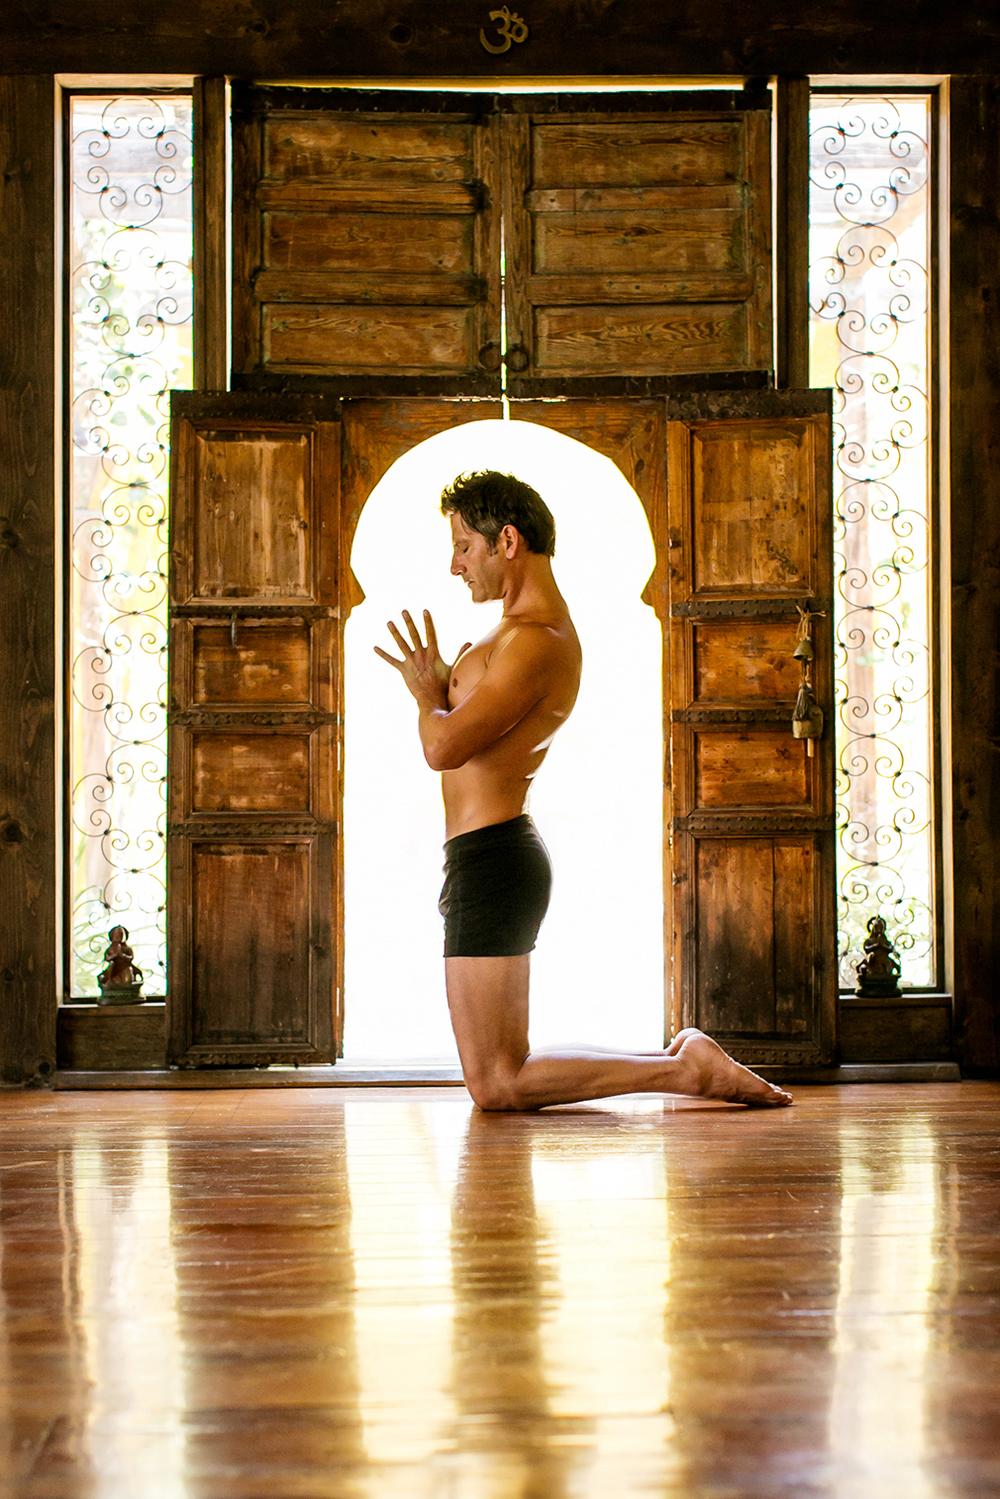 tony_g_yoga_07_retouch_web1500px.jpg